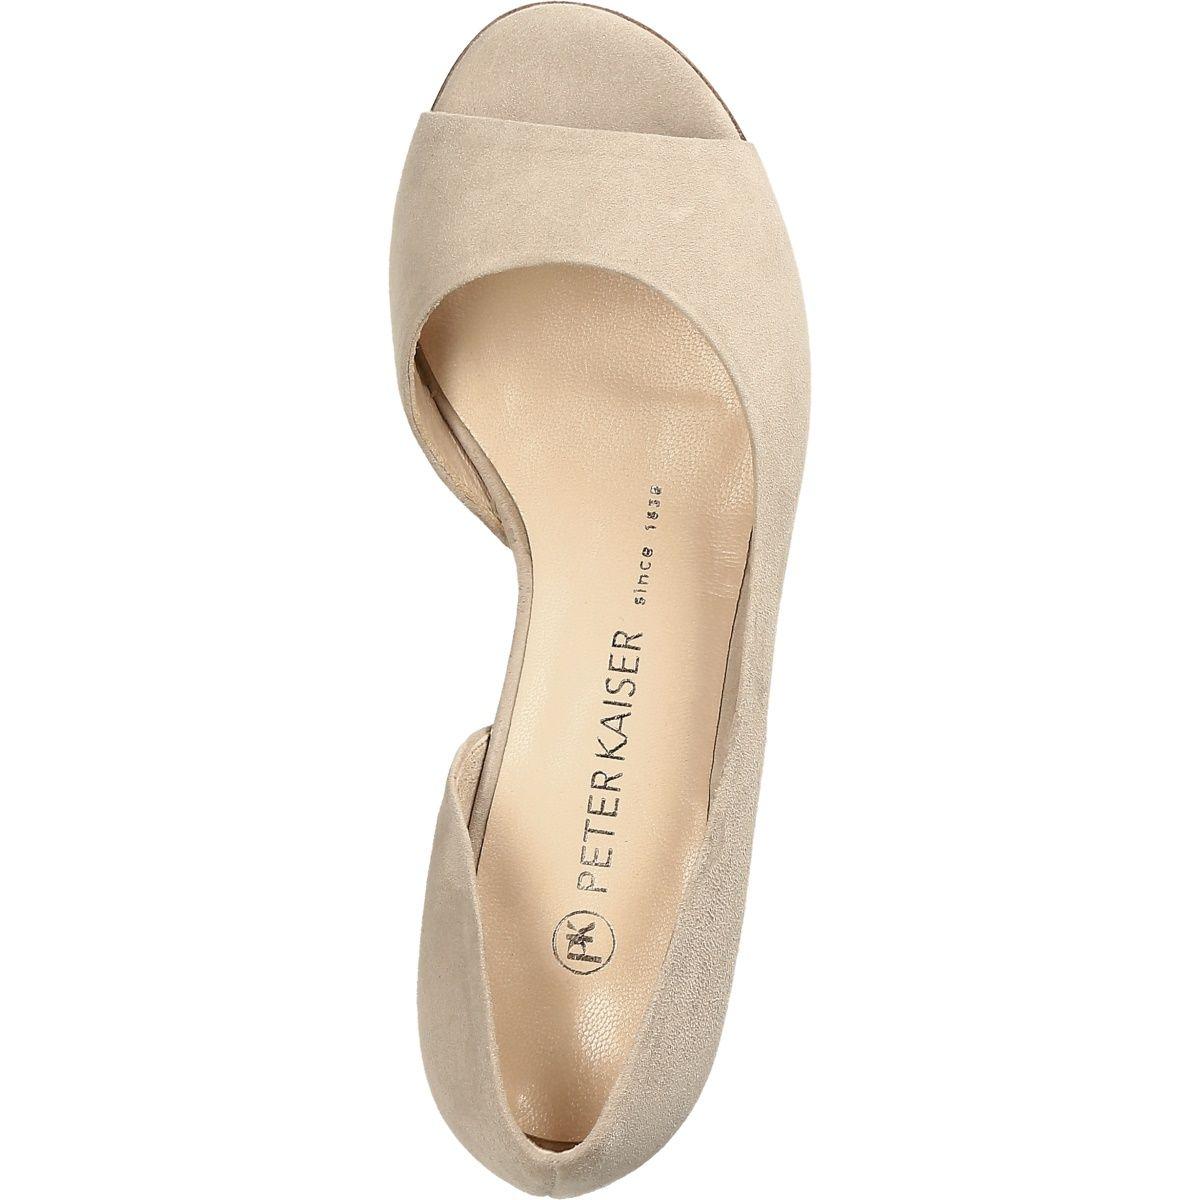 premium selection db5bf 94f66 Peter Kaiser 94135 125 PURA Women's shoes Peeptoes ...